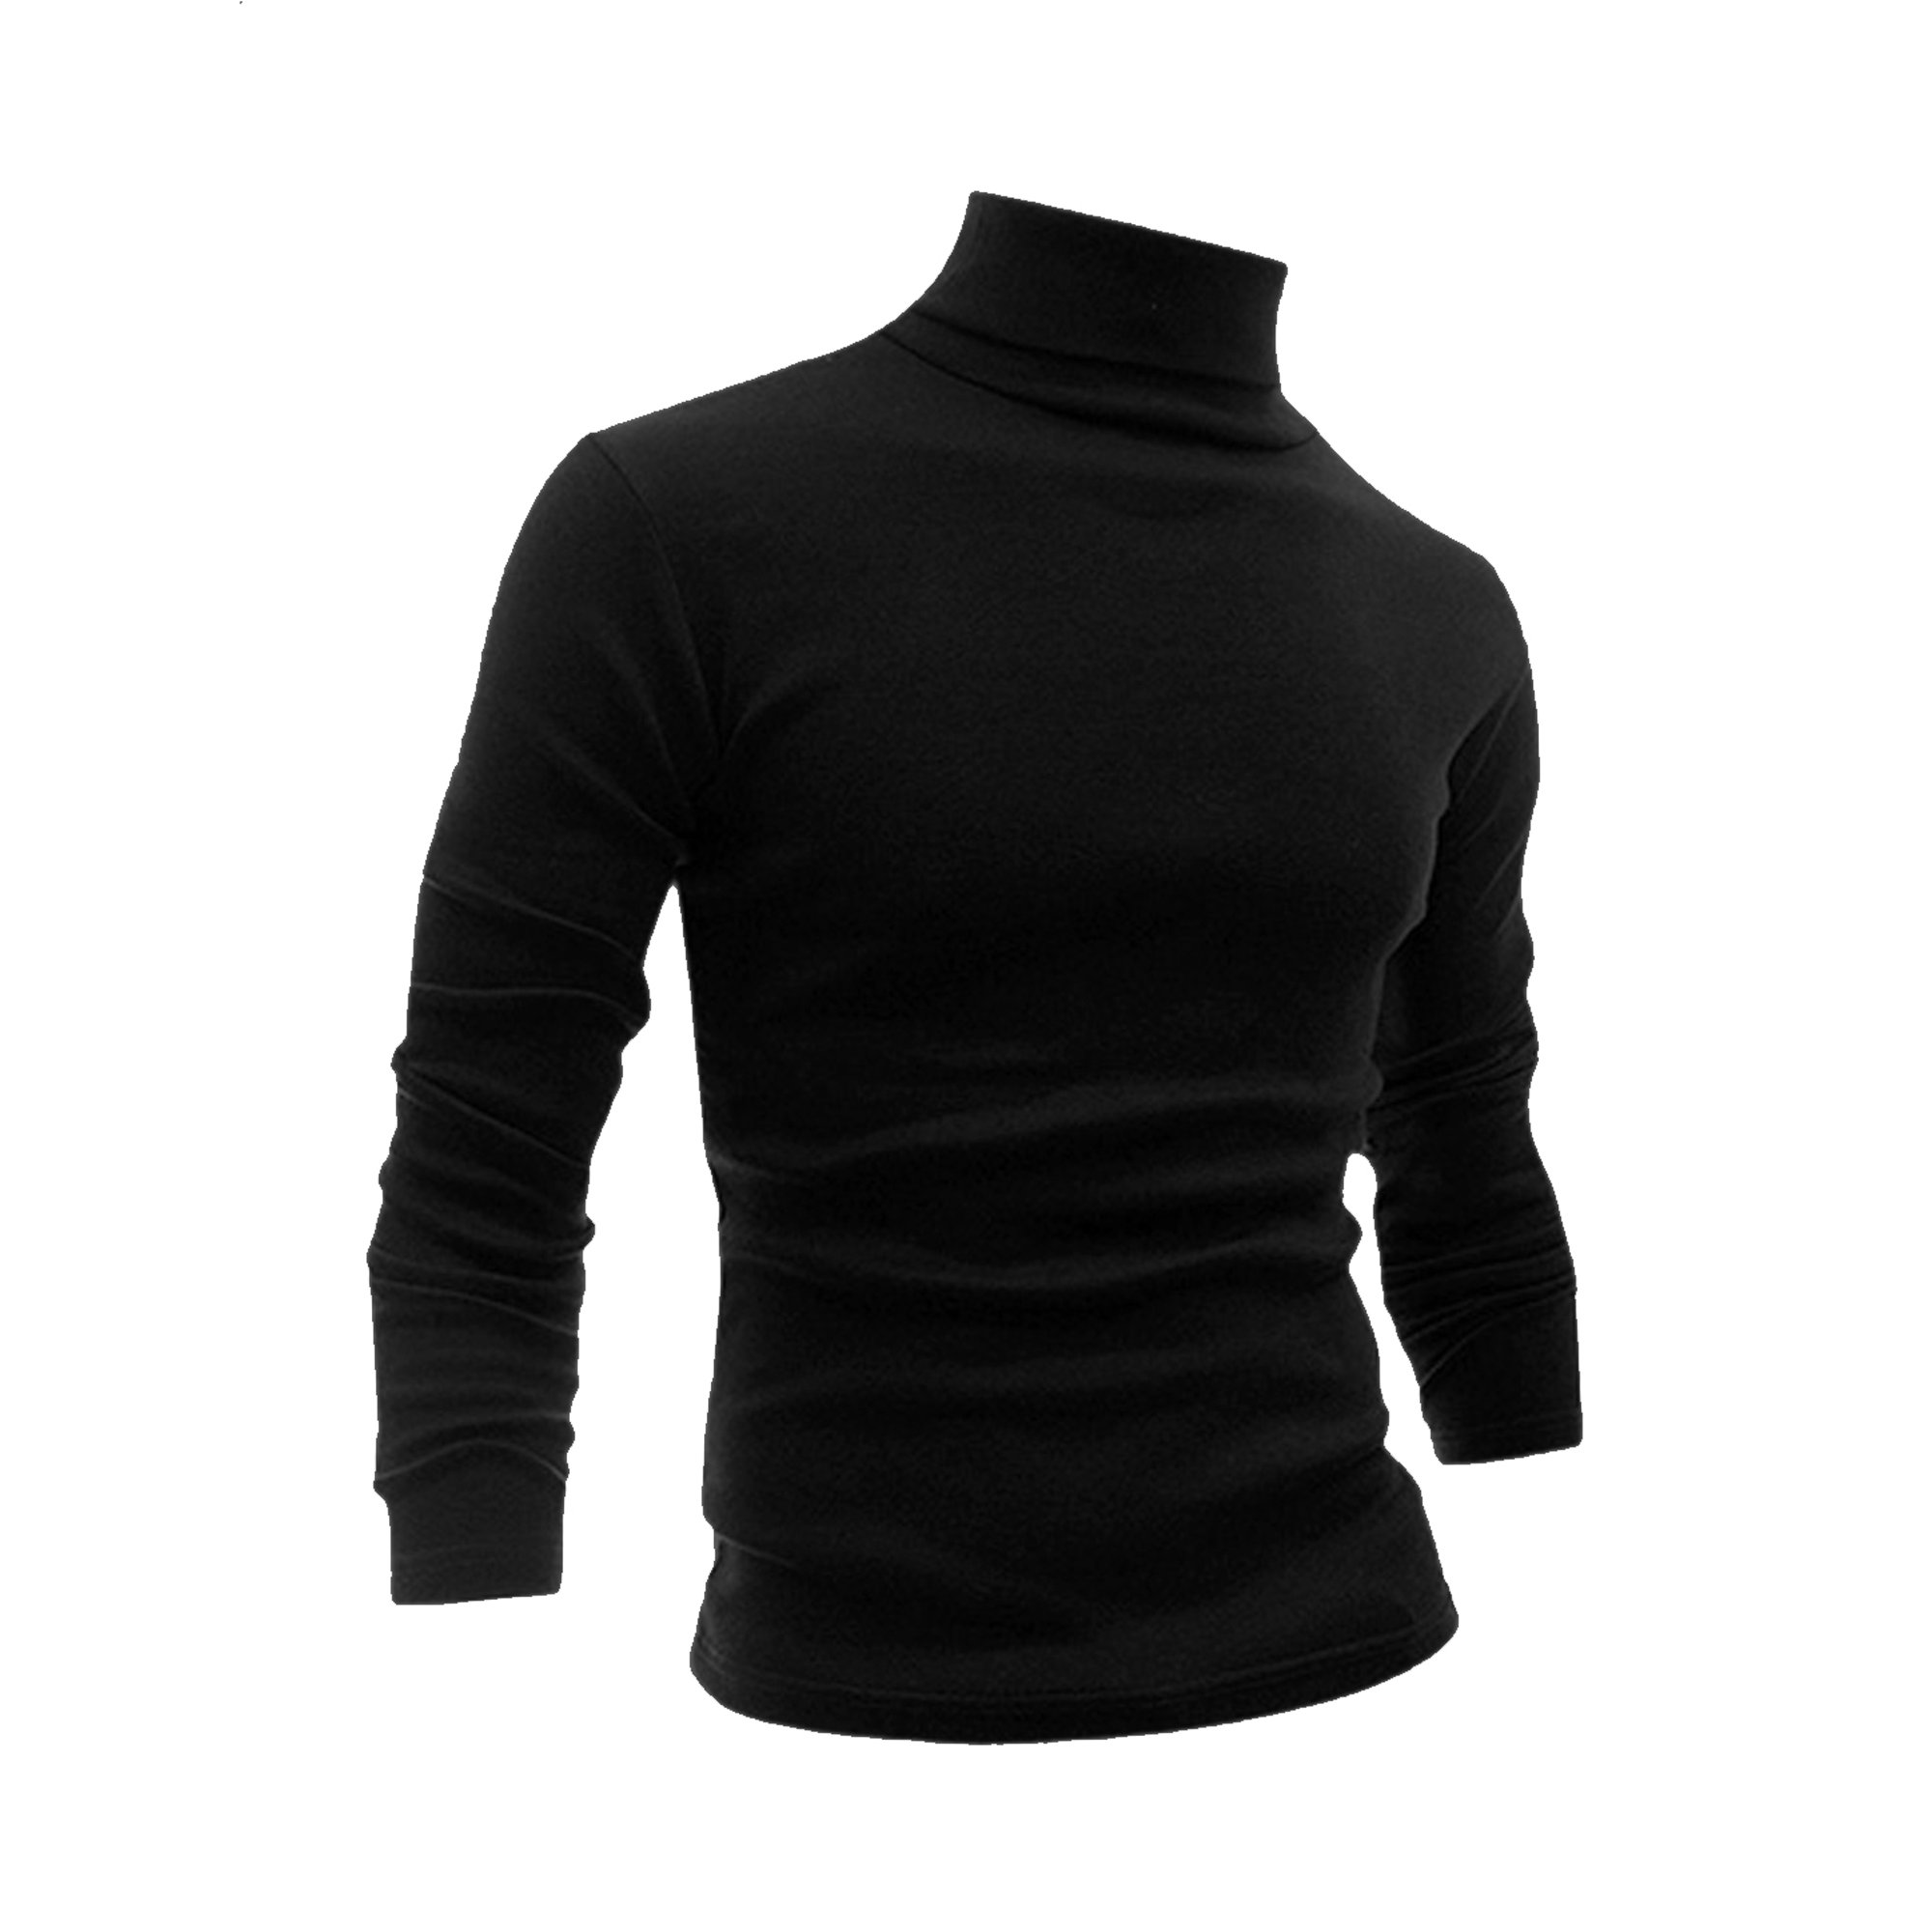 5373e3289 Man Long Sleeve Turtle Neck Slim Fit Casual T-shirt Black S ...